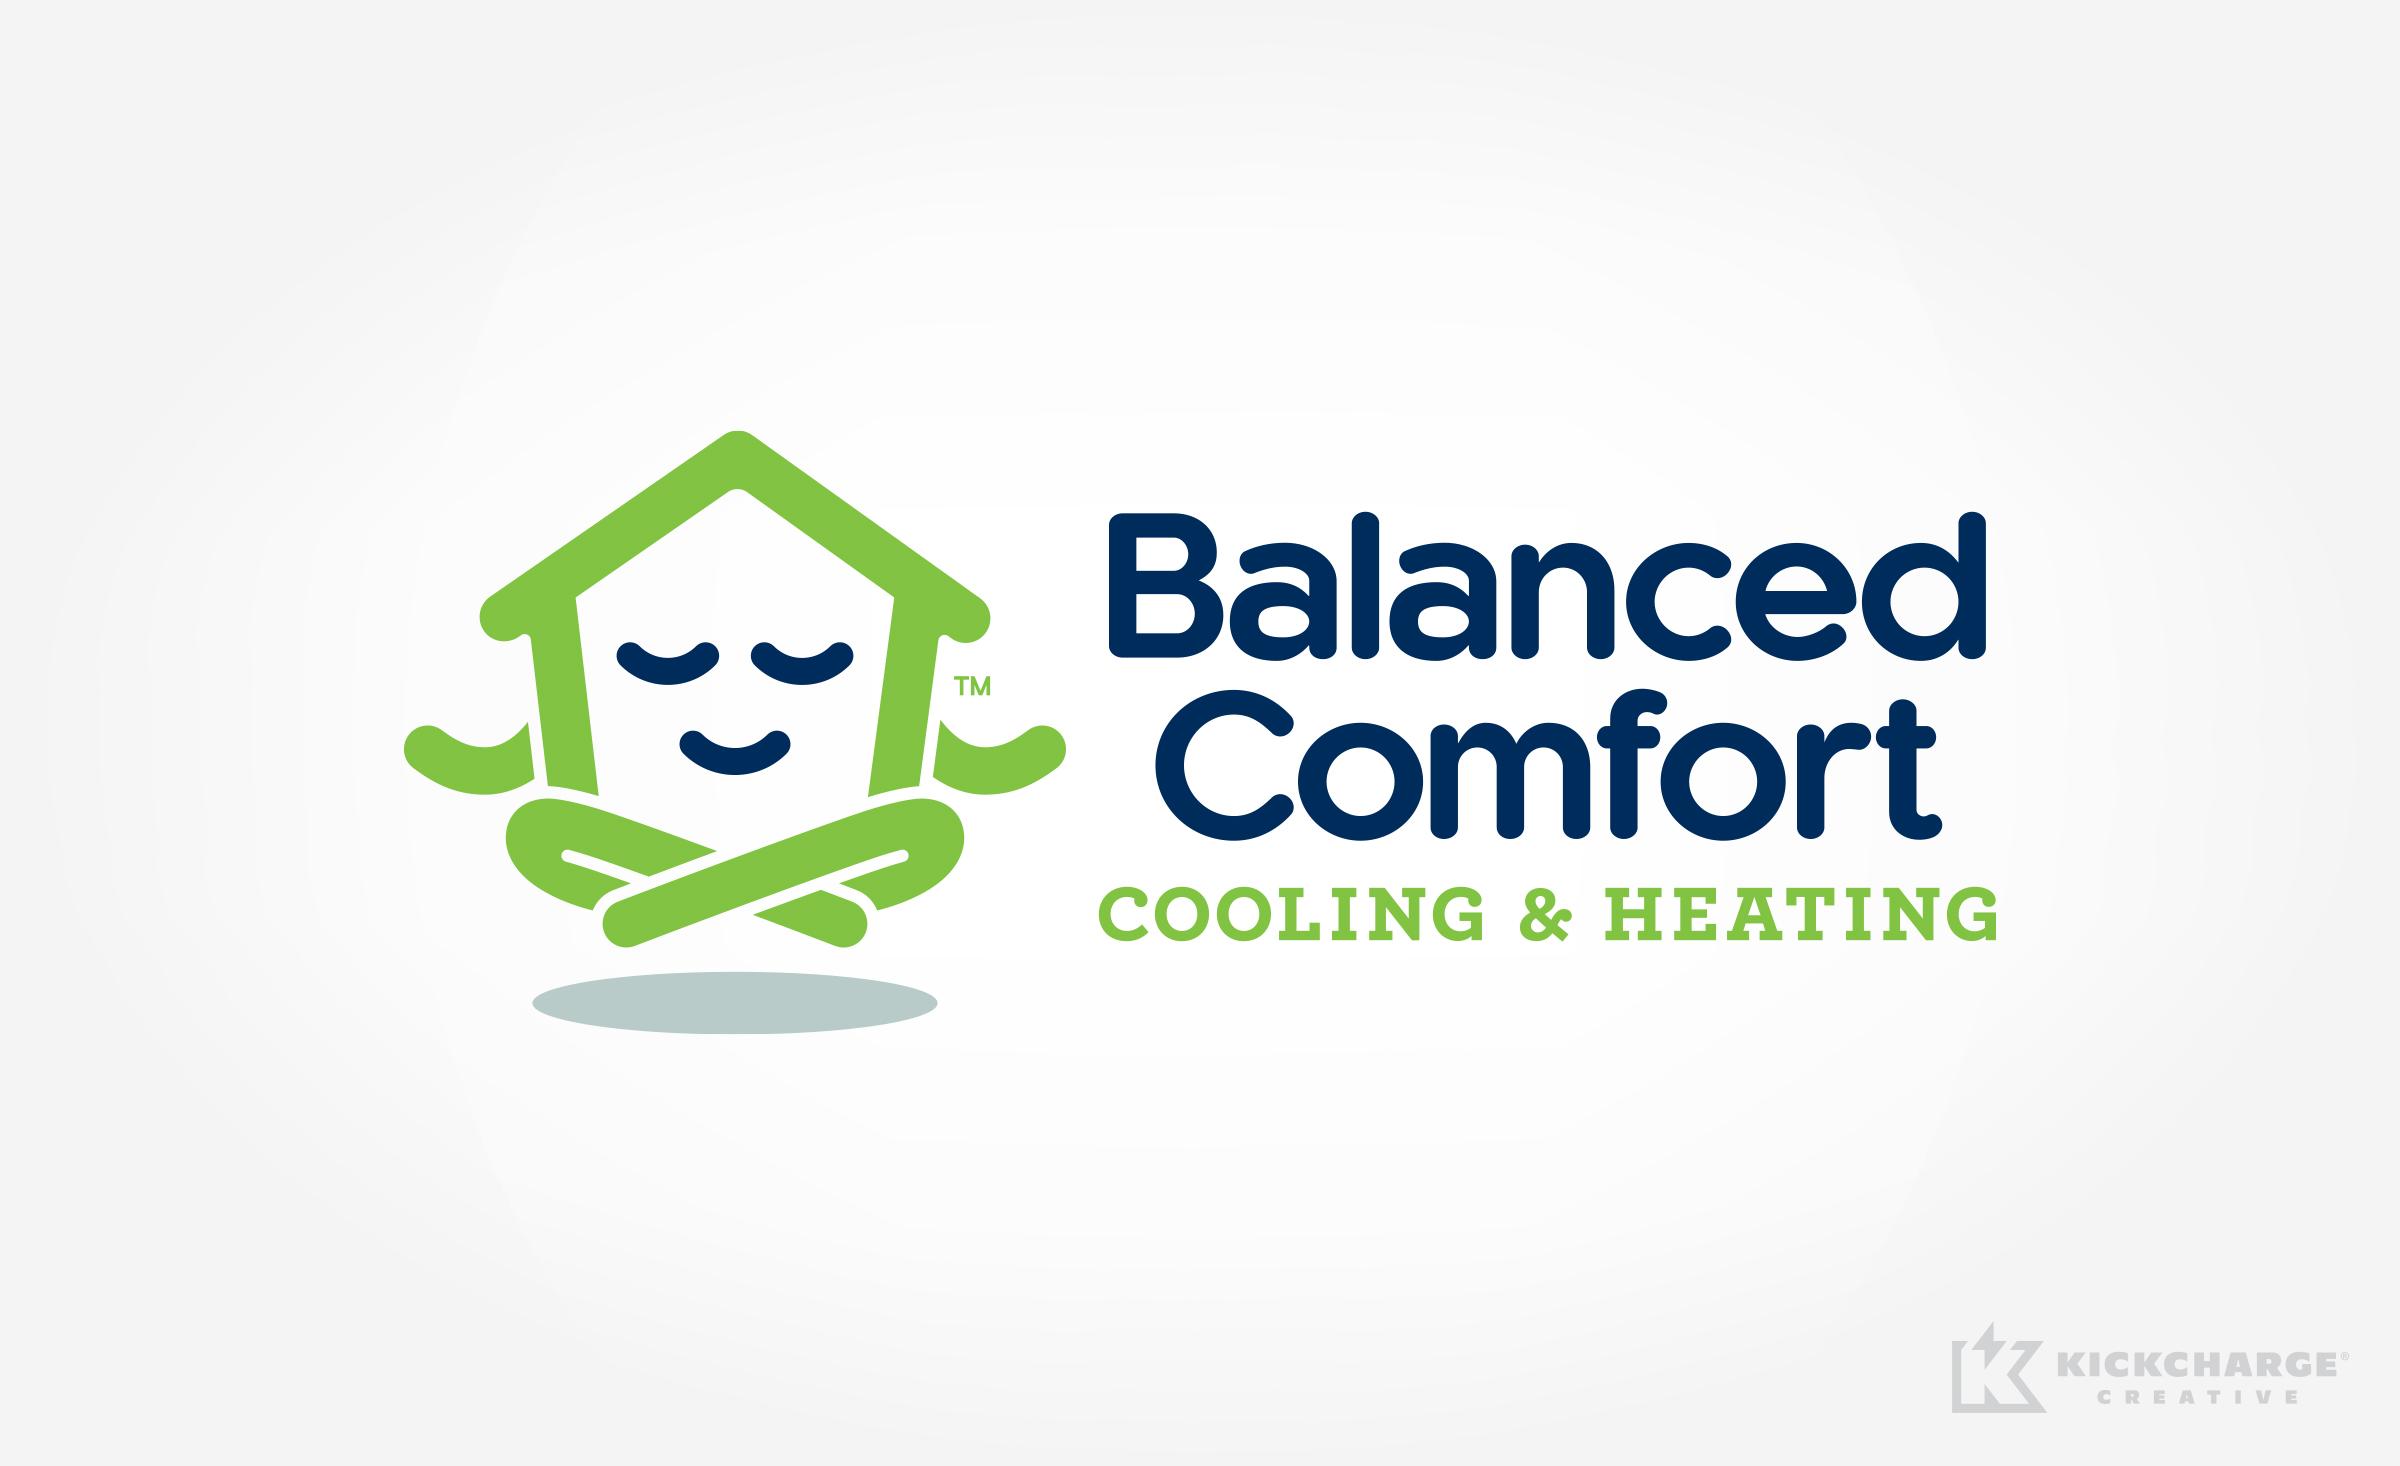 hvac logo for balanced comfort